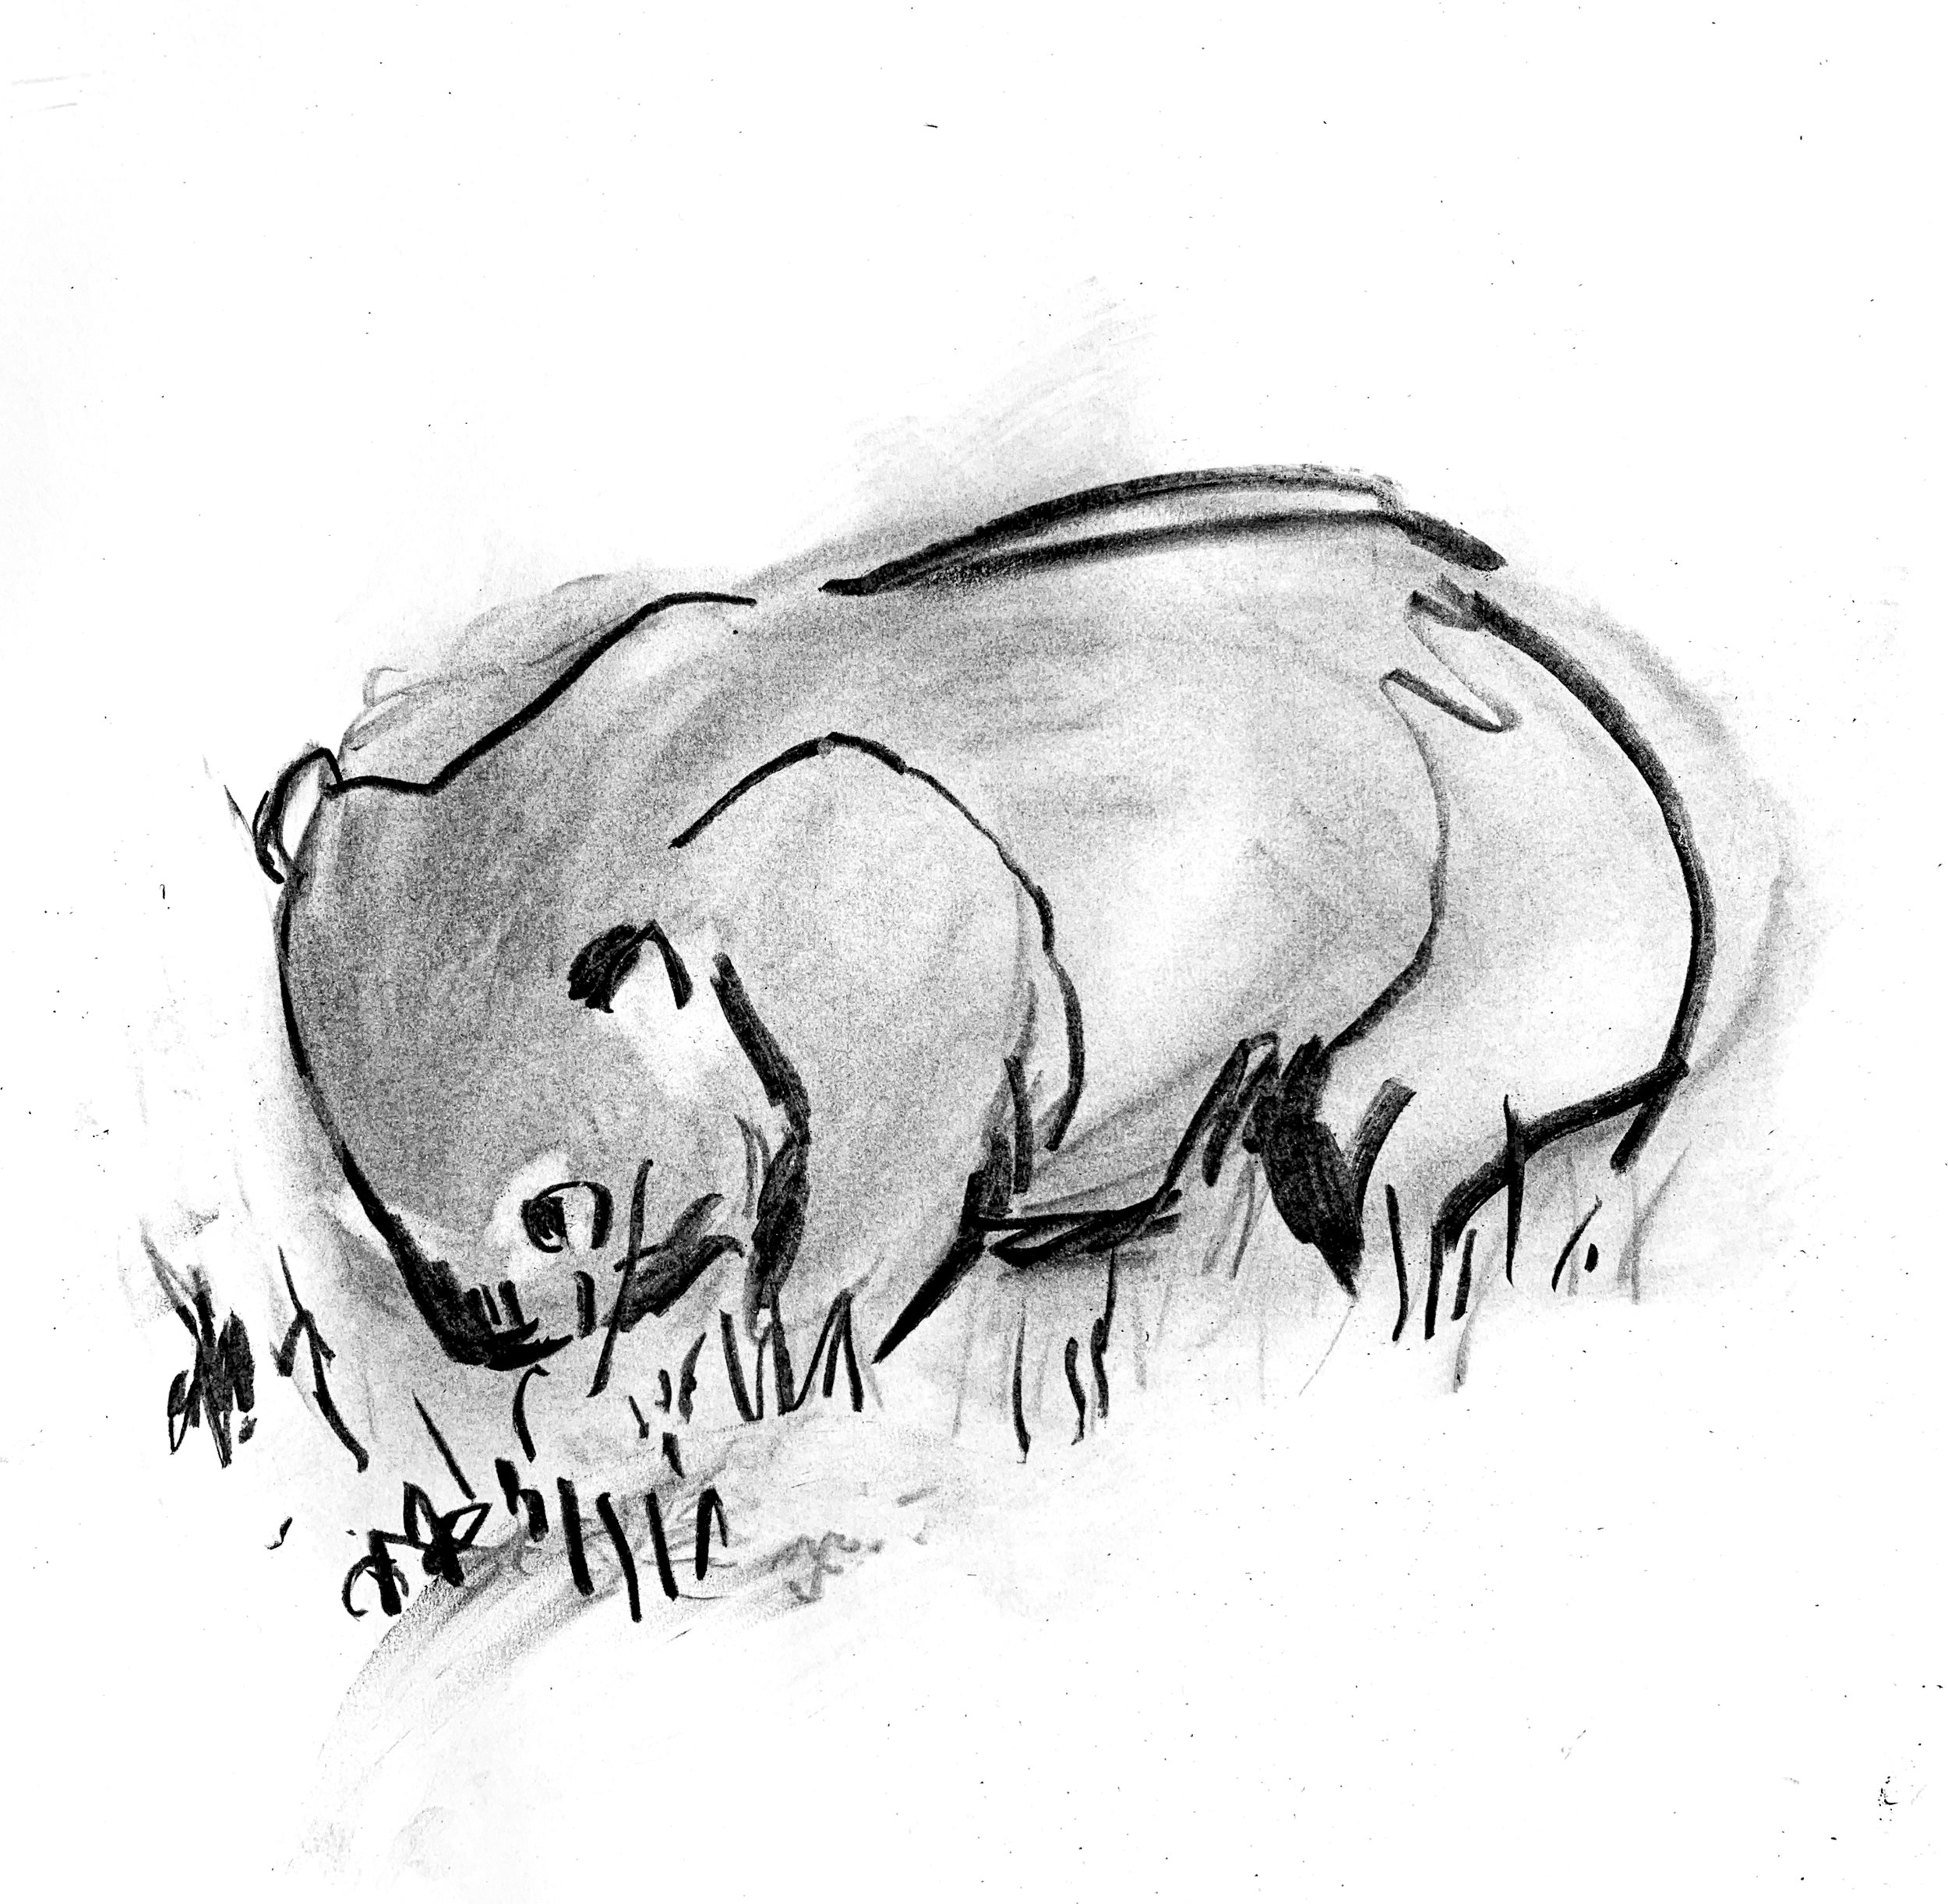 wombat sketch.jpg